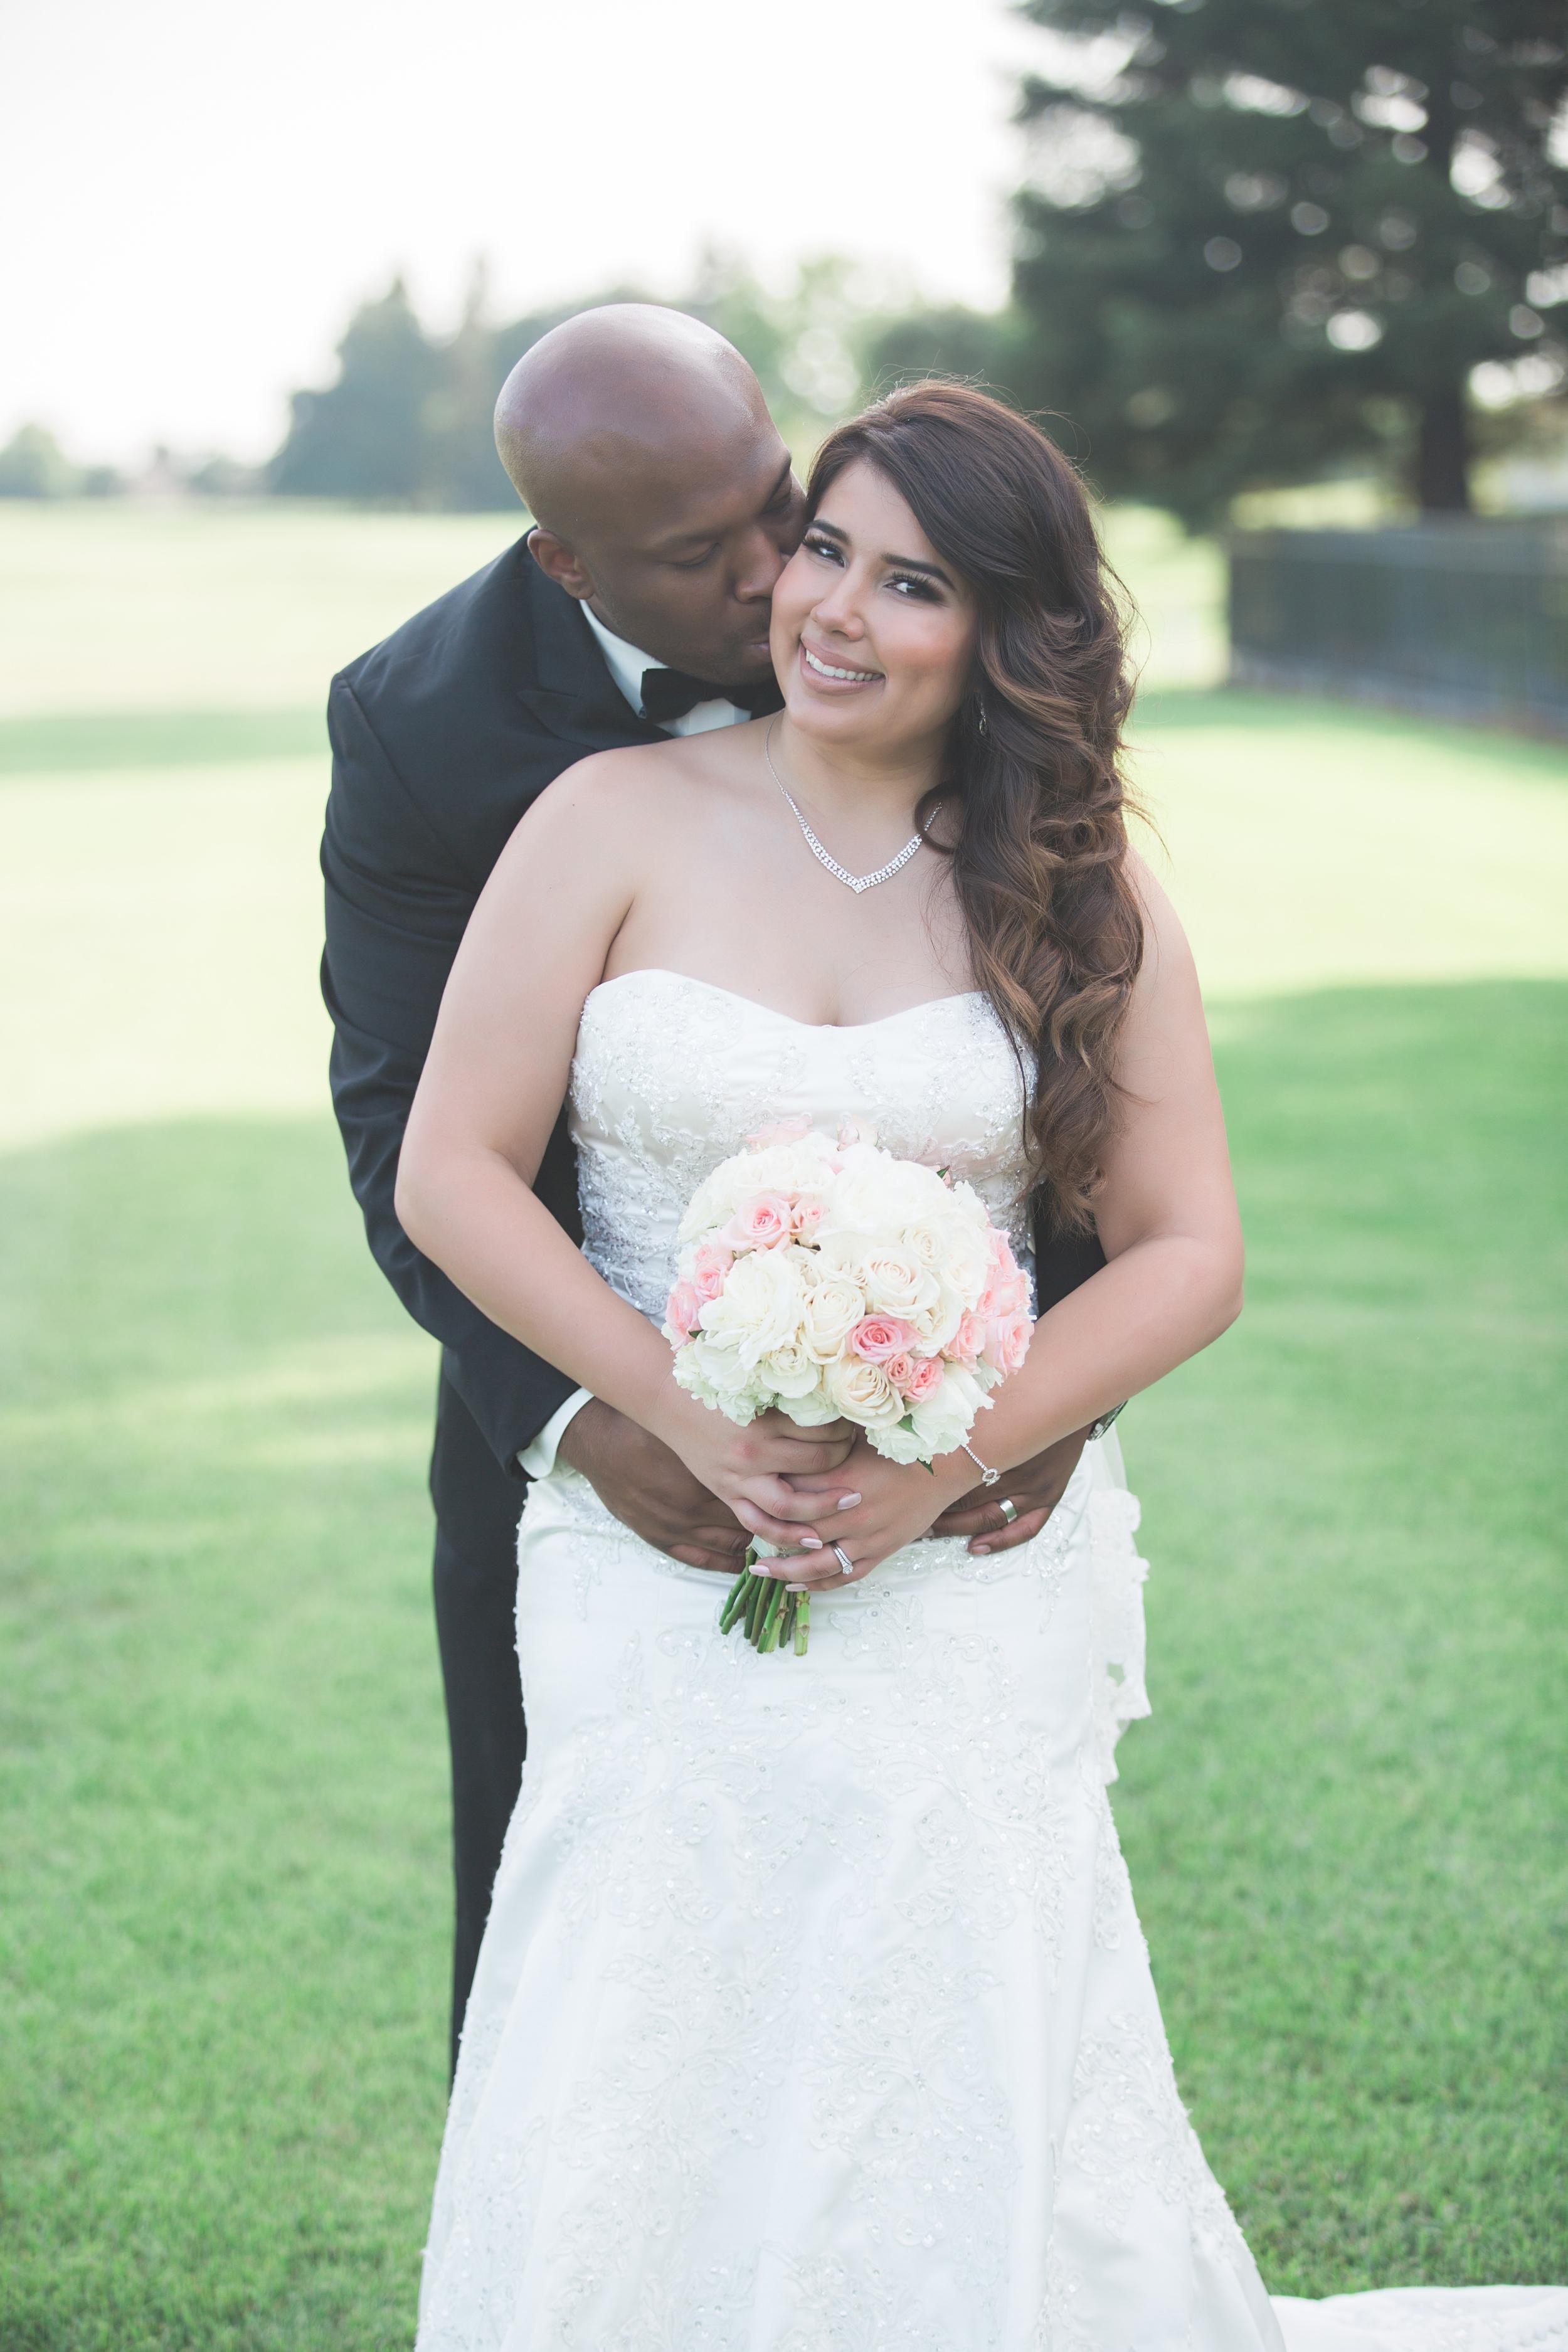 Mr & Mrs Photography 16.jpg